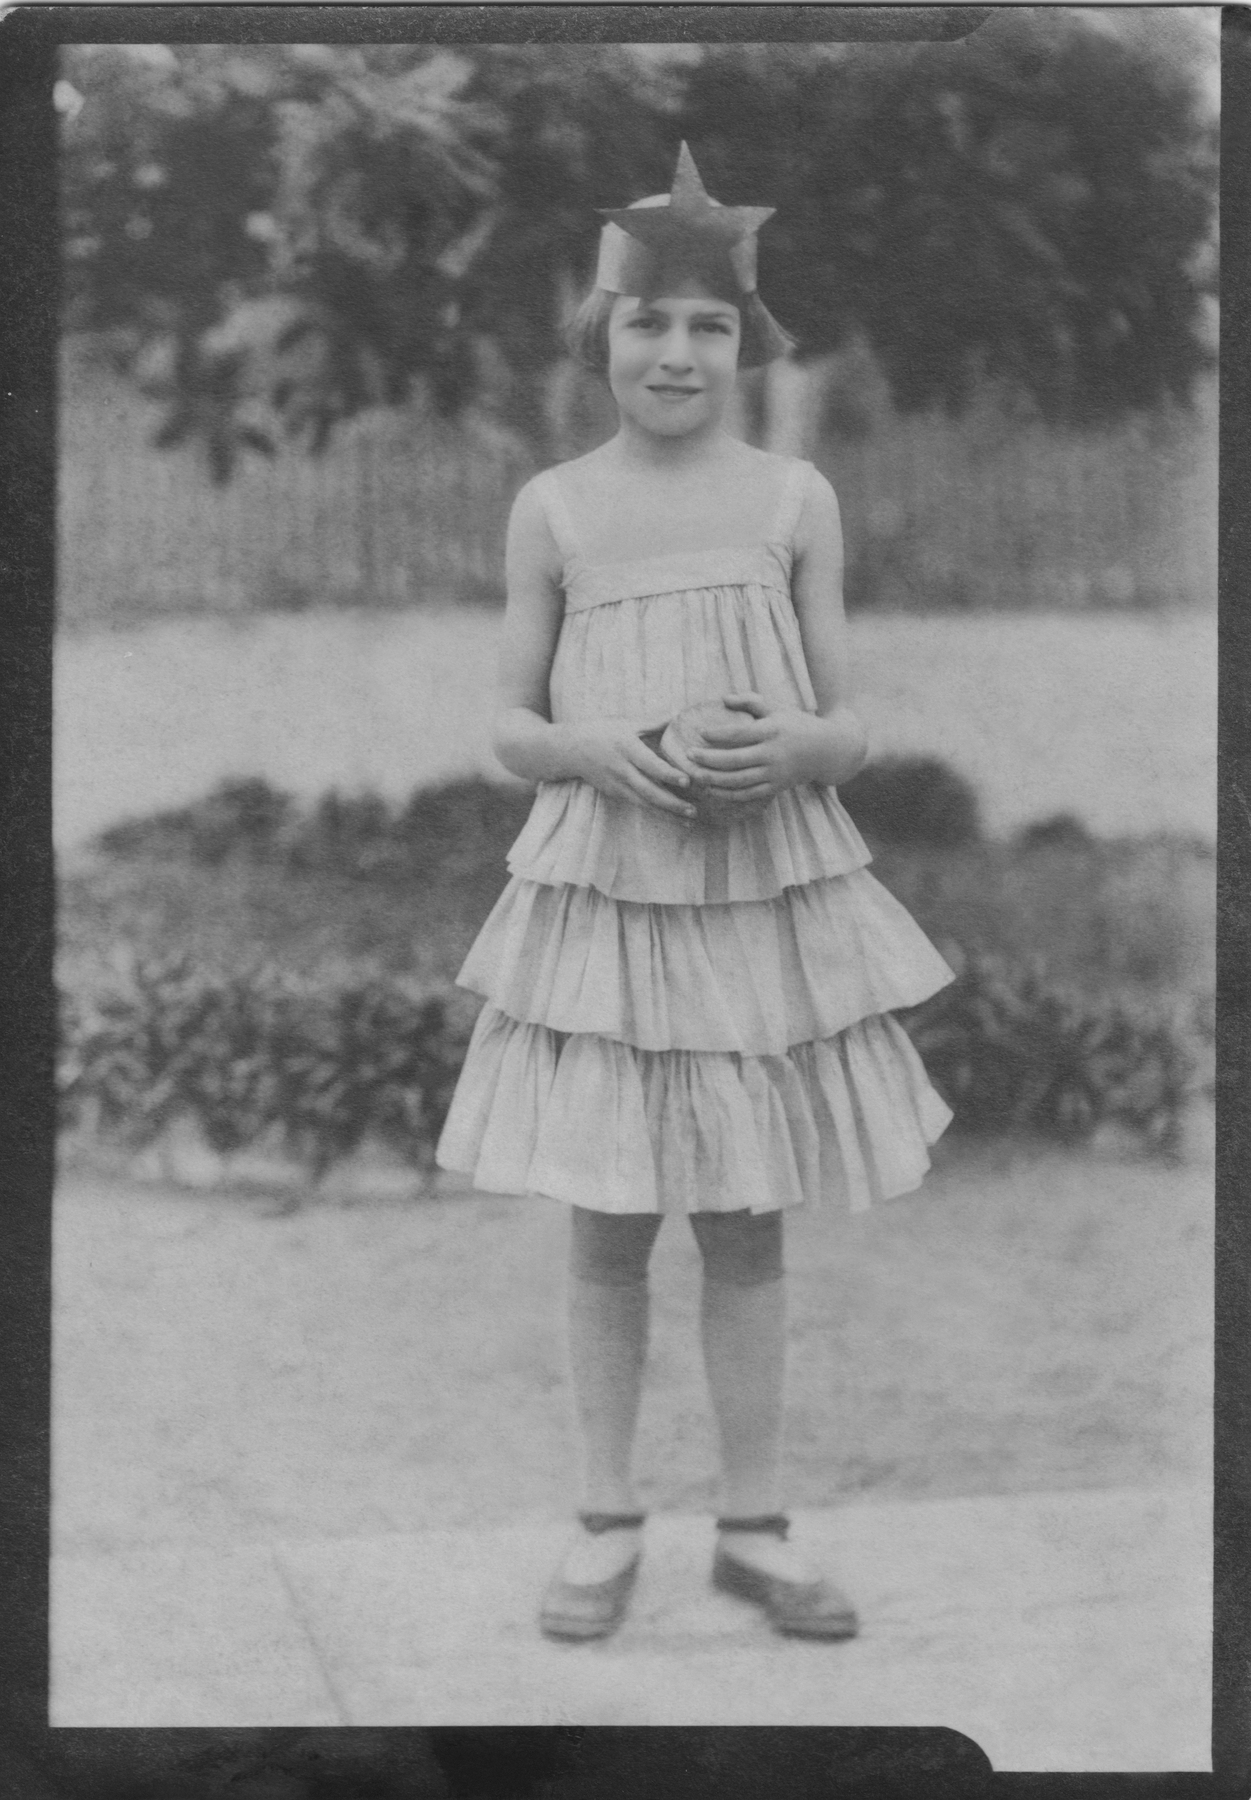 Starlene, Someqwhere in America, circa 1920's